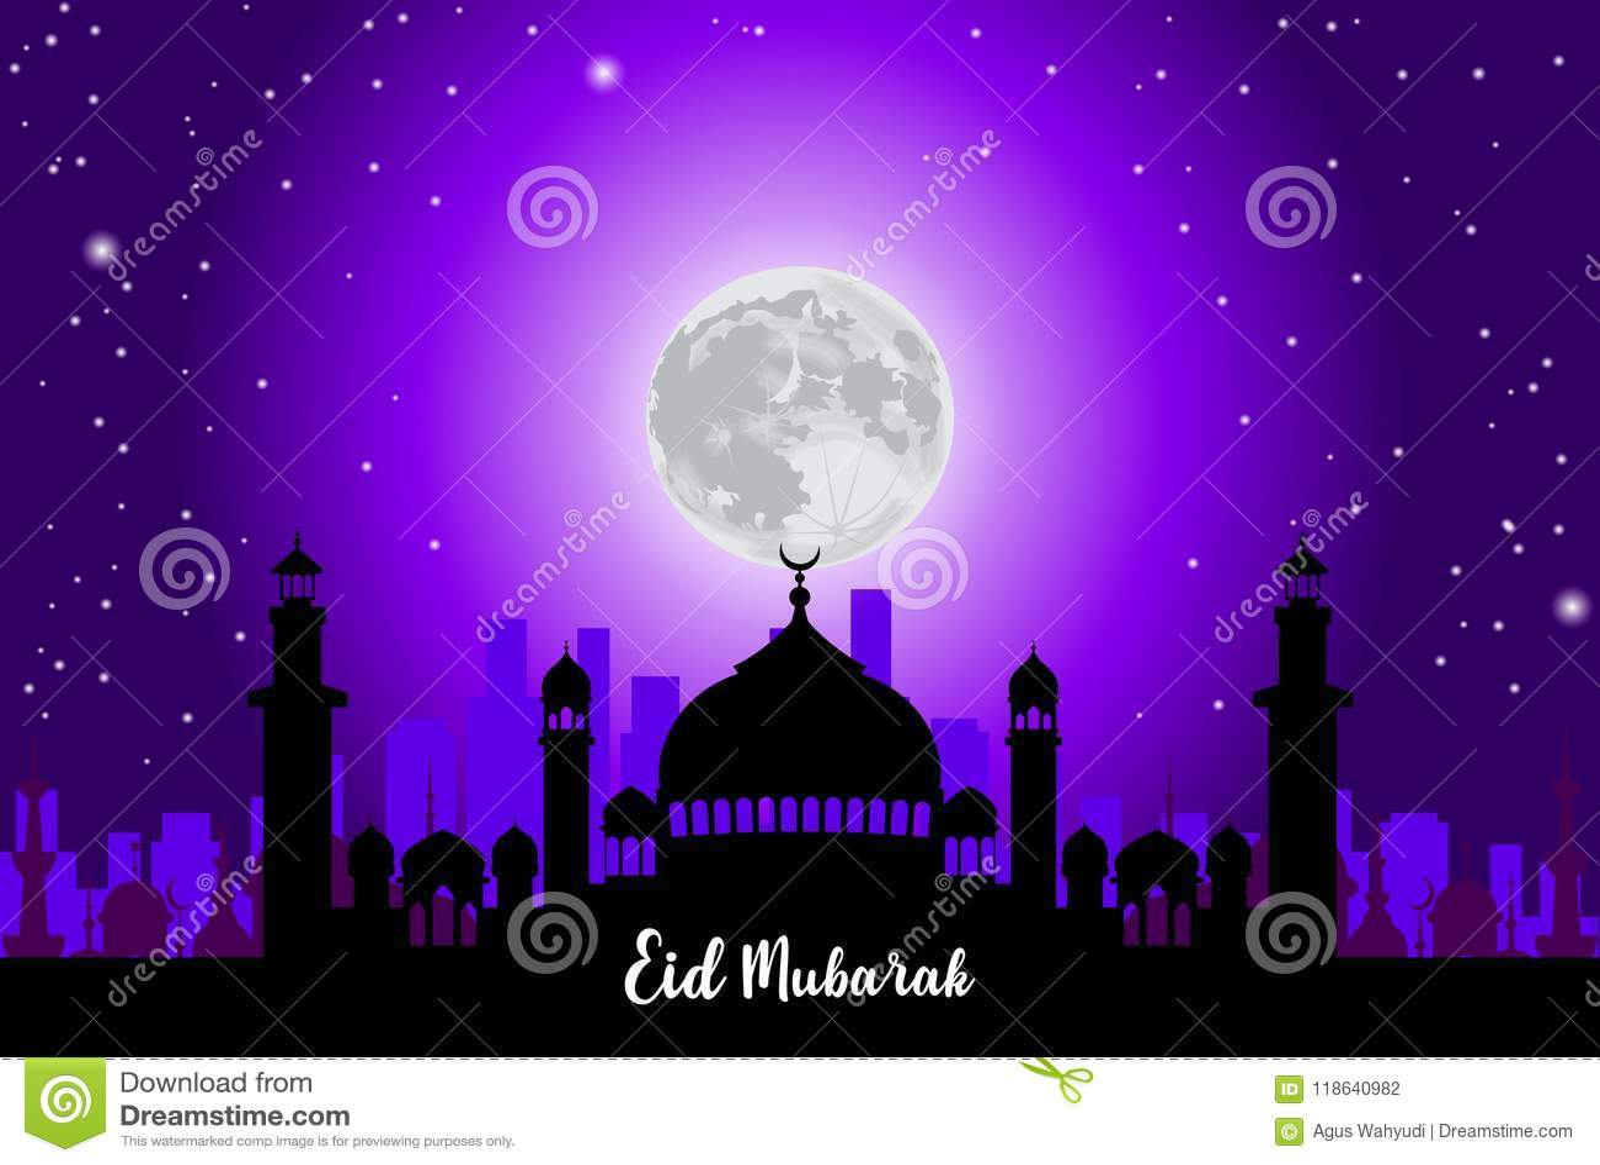 Abstract background for islamic greeting eid mubarak stock abstract background for islamic greeting eid mubarak m4hsunfo